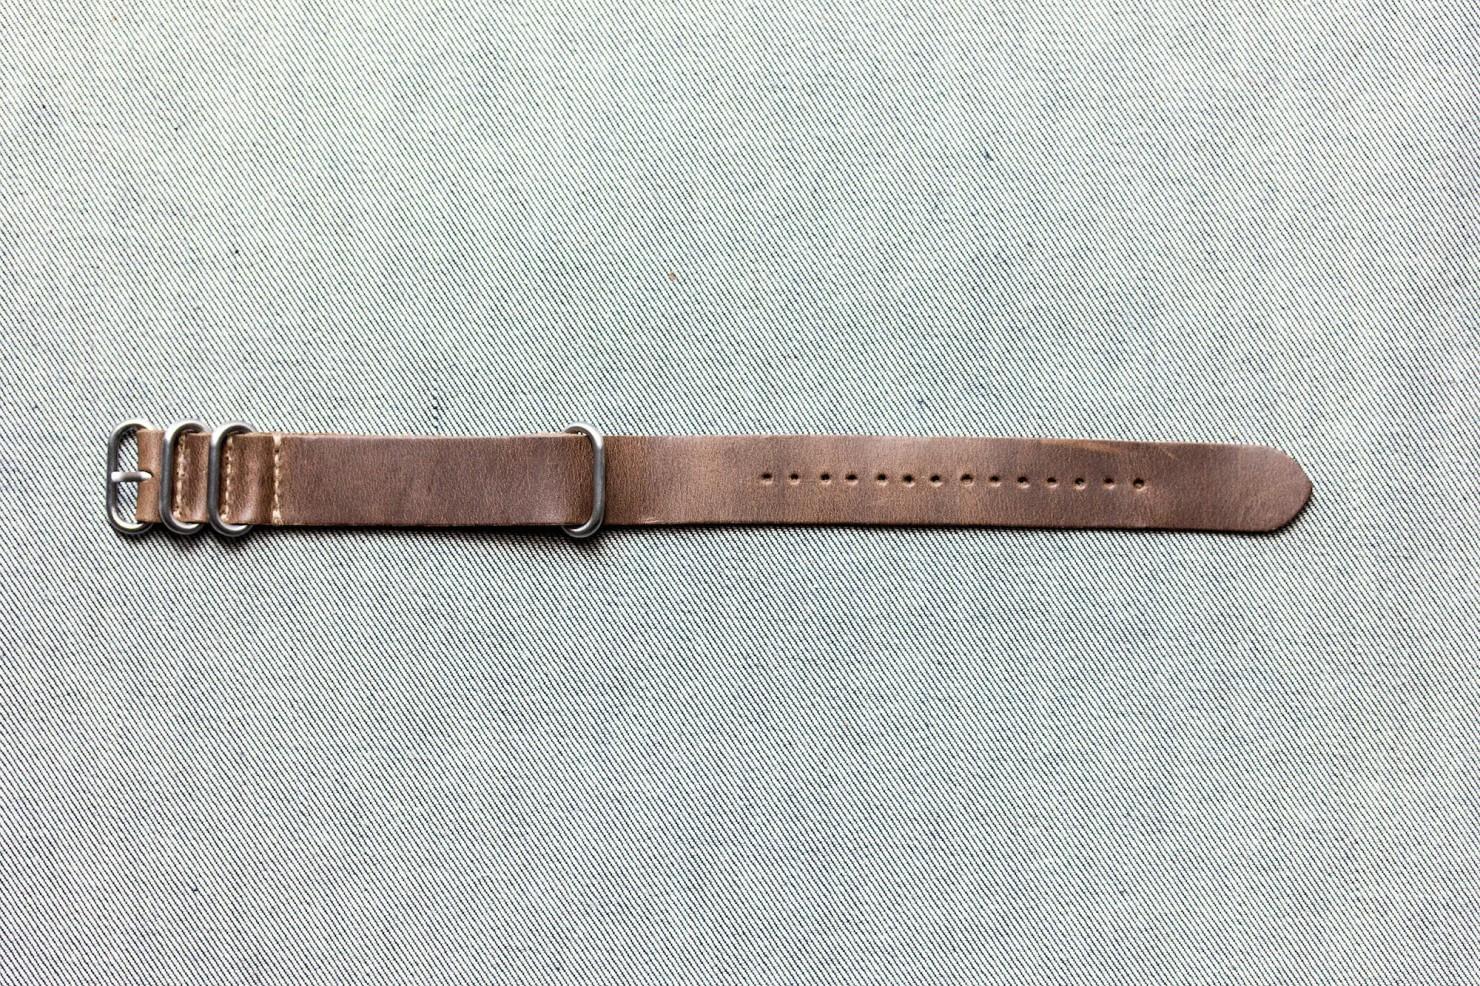 Military Watch Strap by Worn & Wound 1